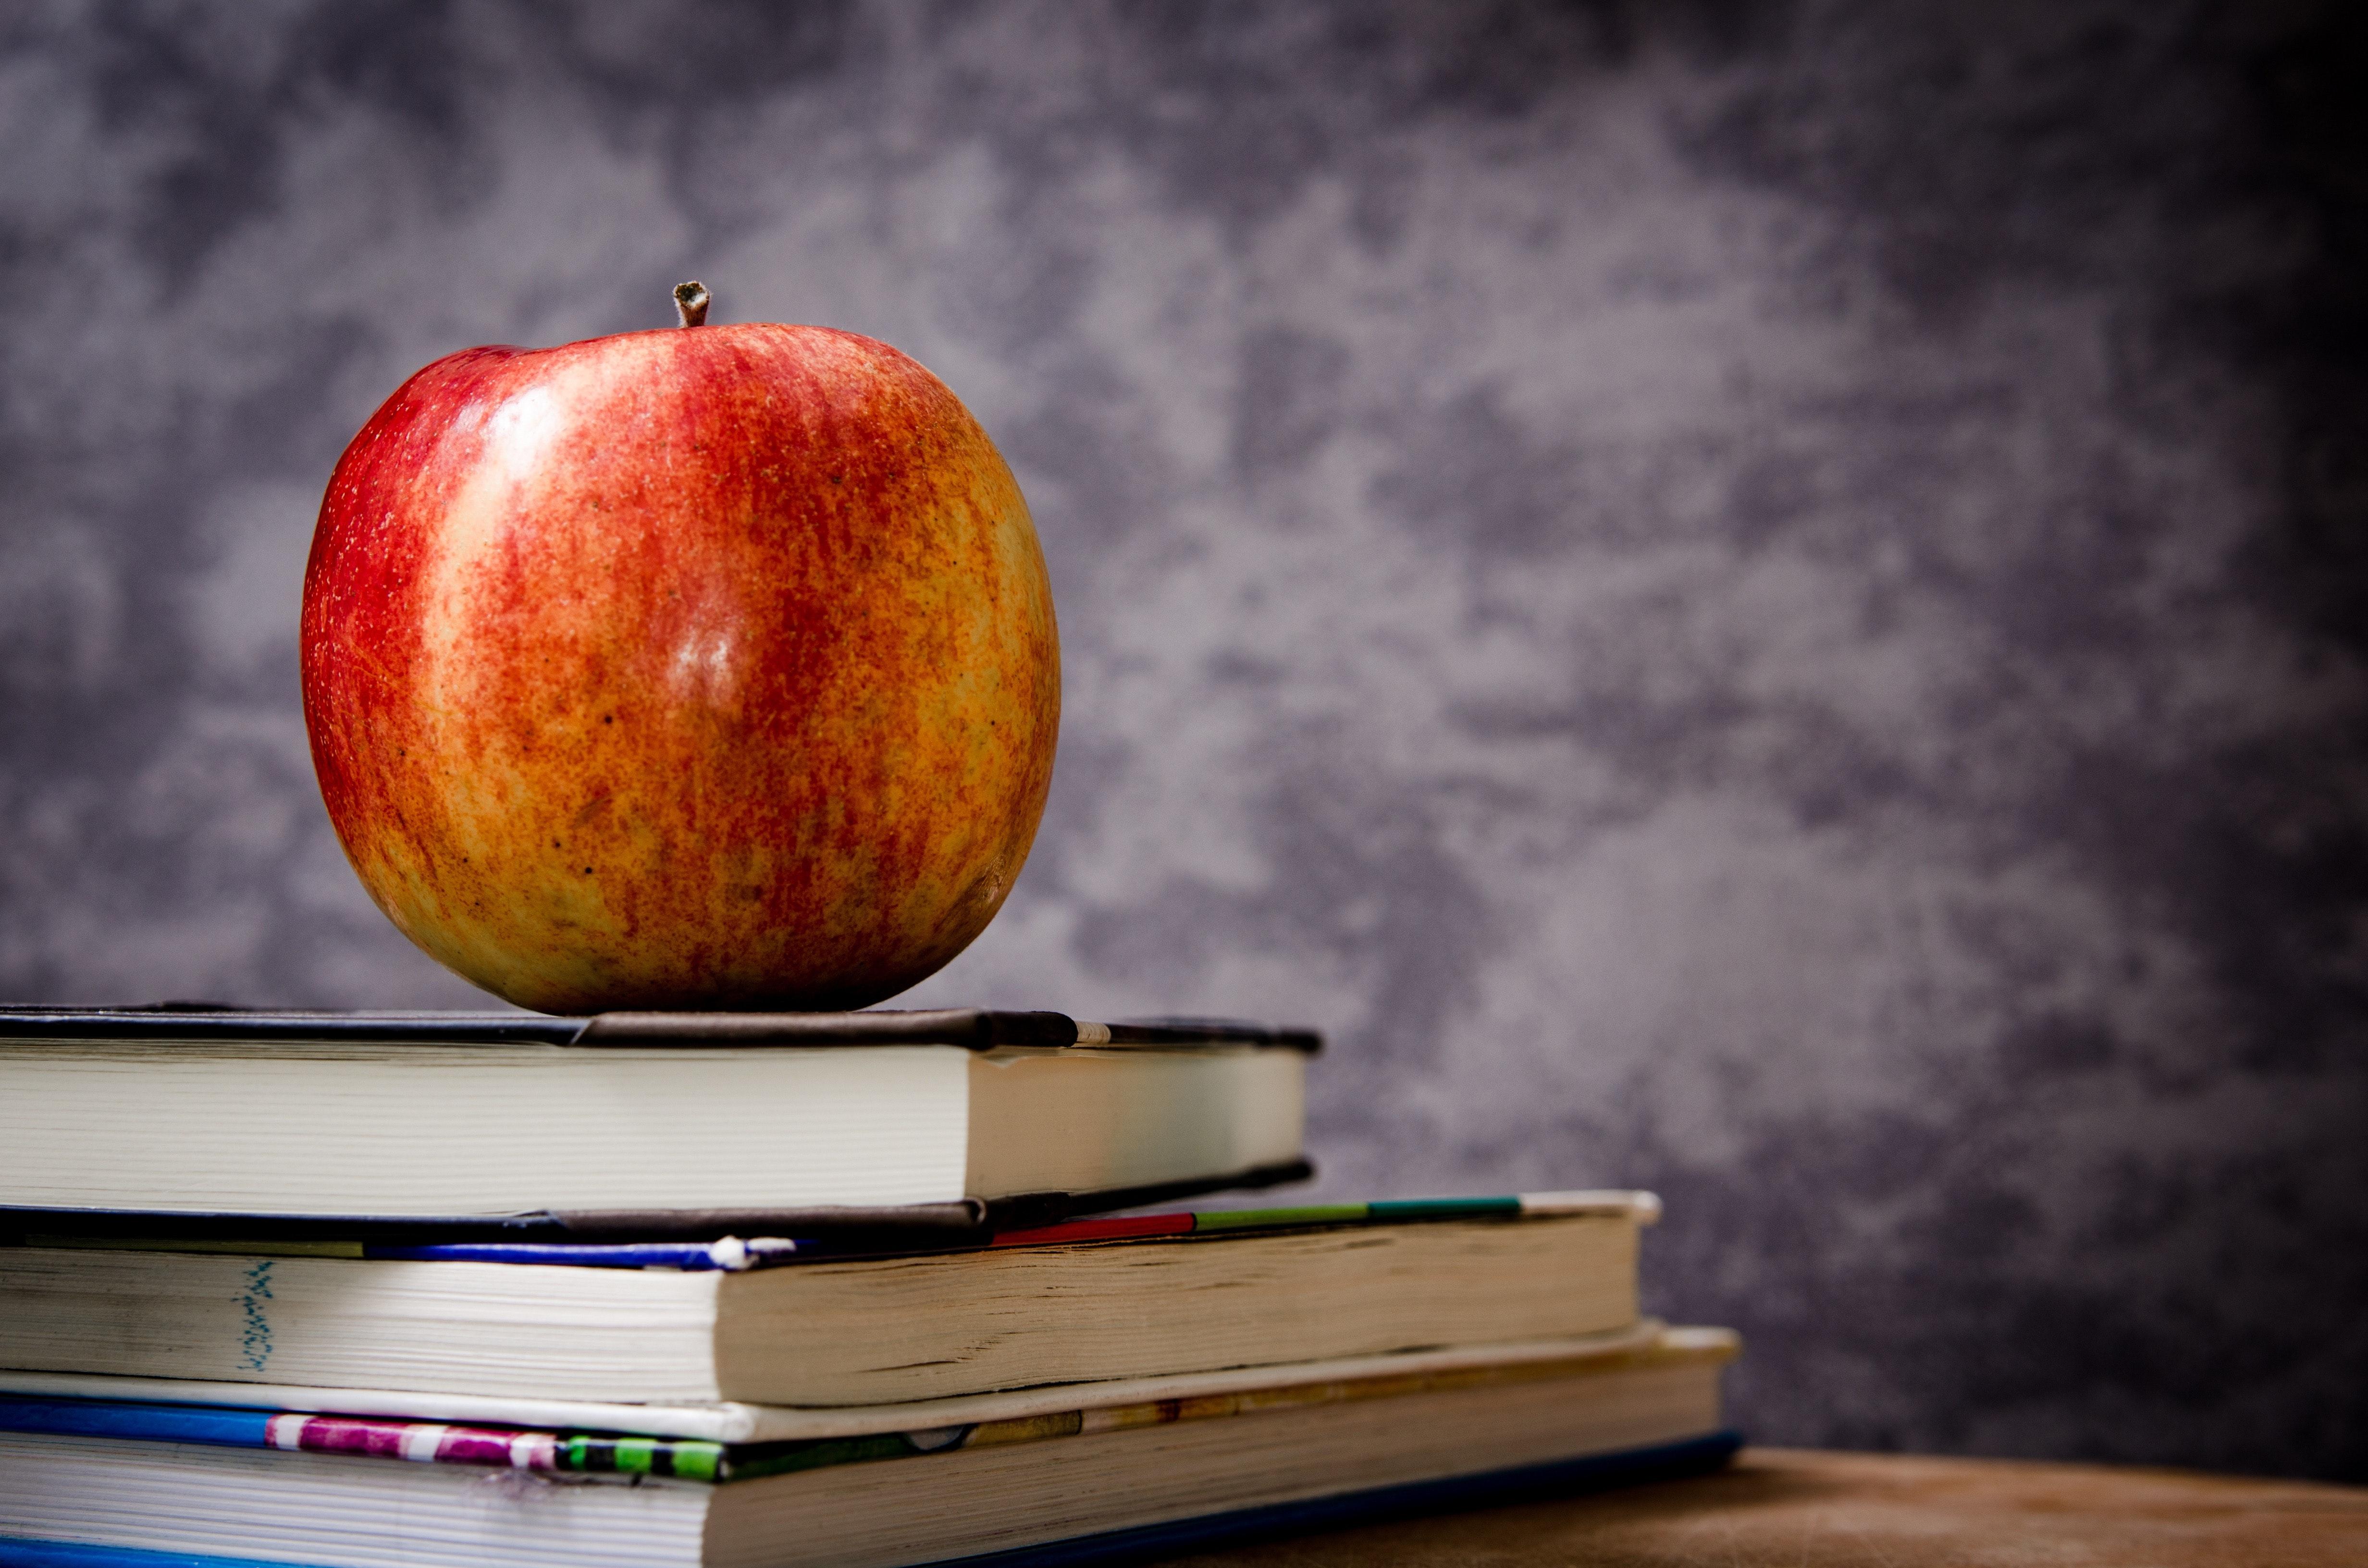 apple-blackboard-books-60583